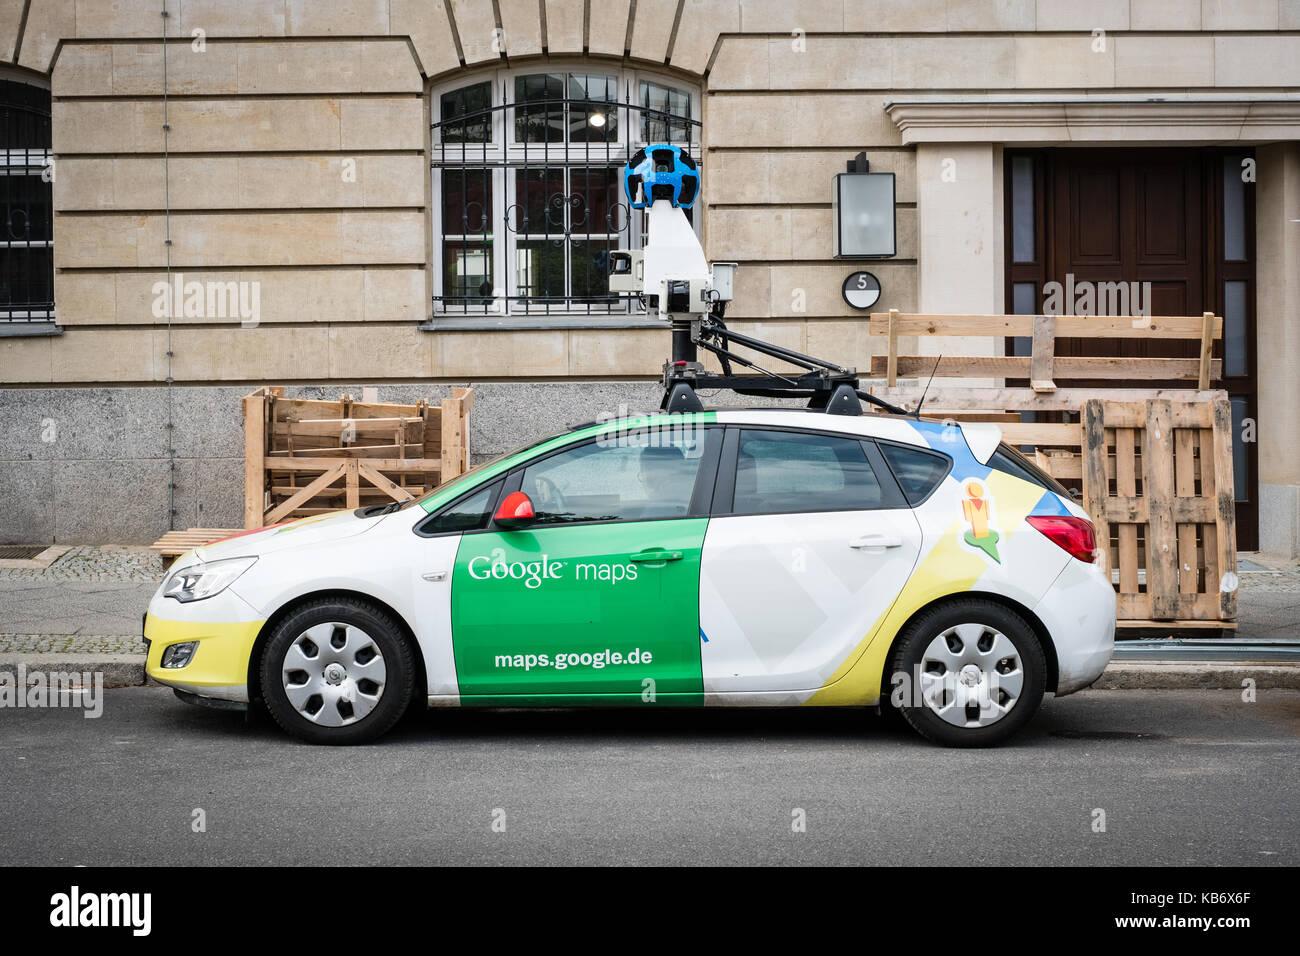 Google Maps Street View Car Camera Stock Photos Google Maps